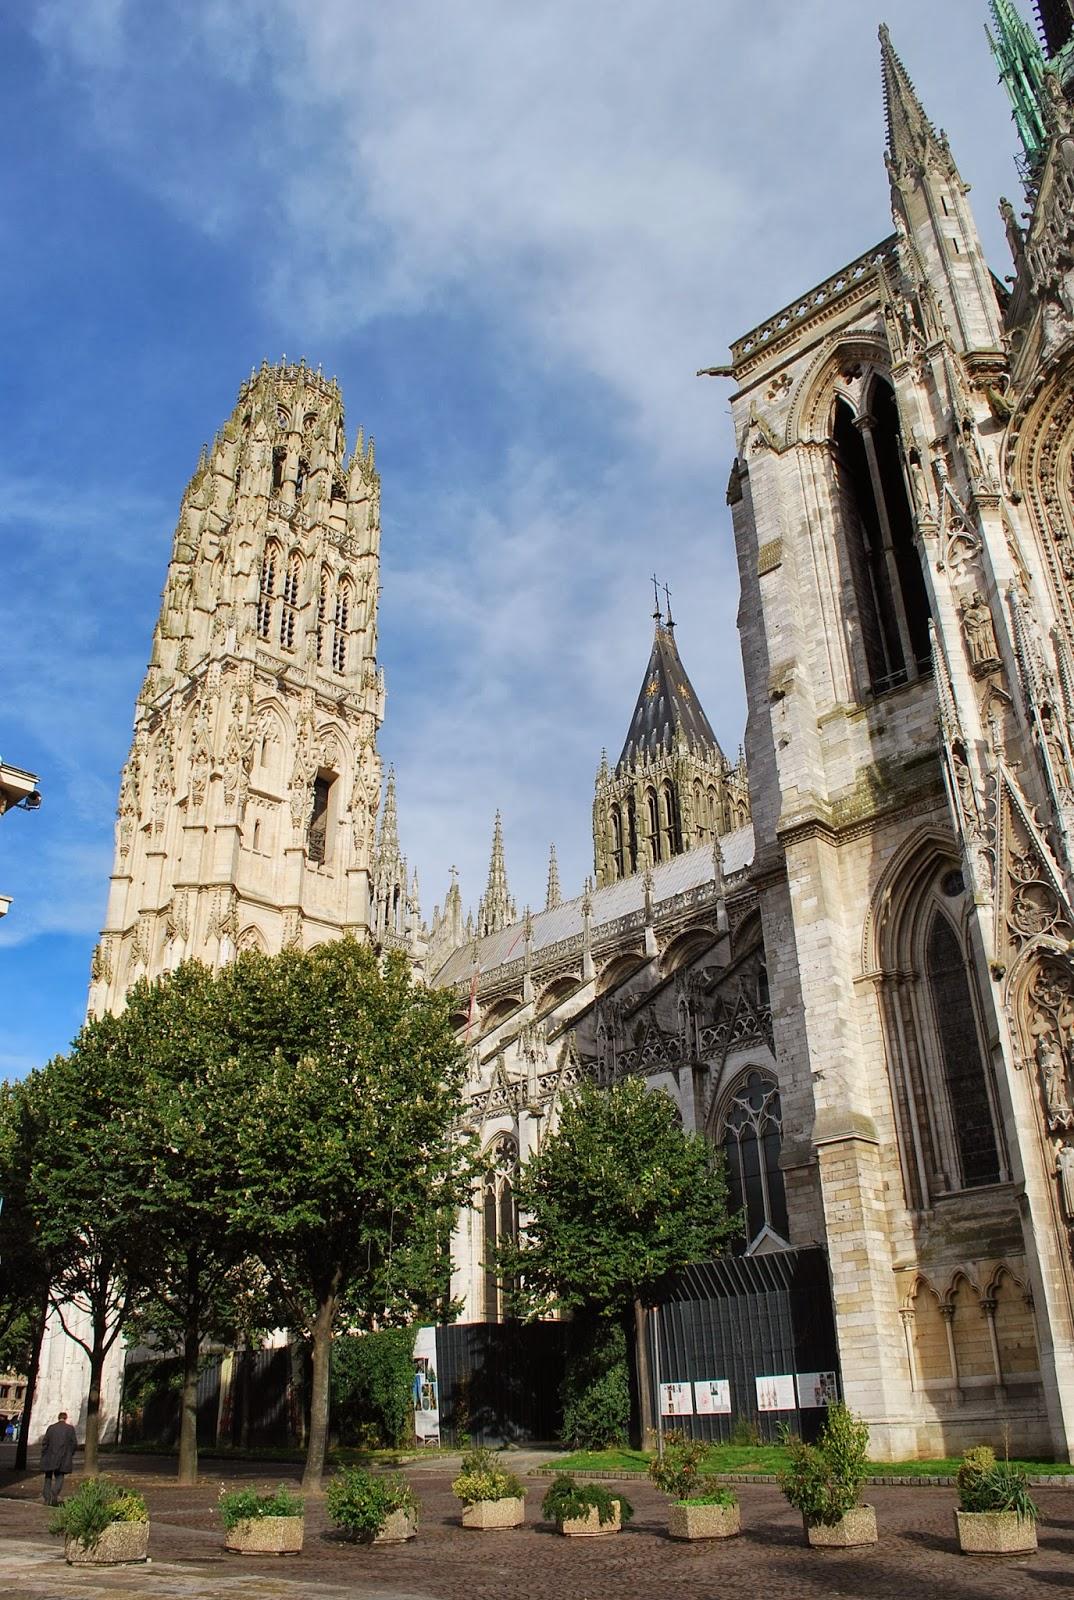 socalgalopenwallet: Rouen cathedral